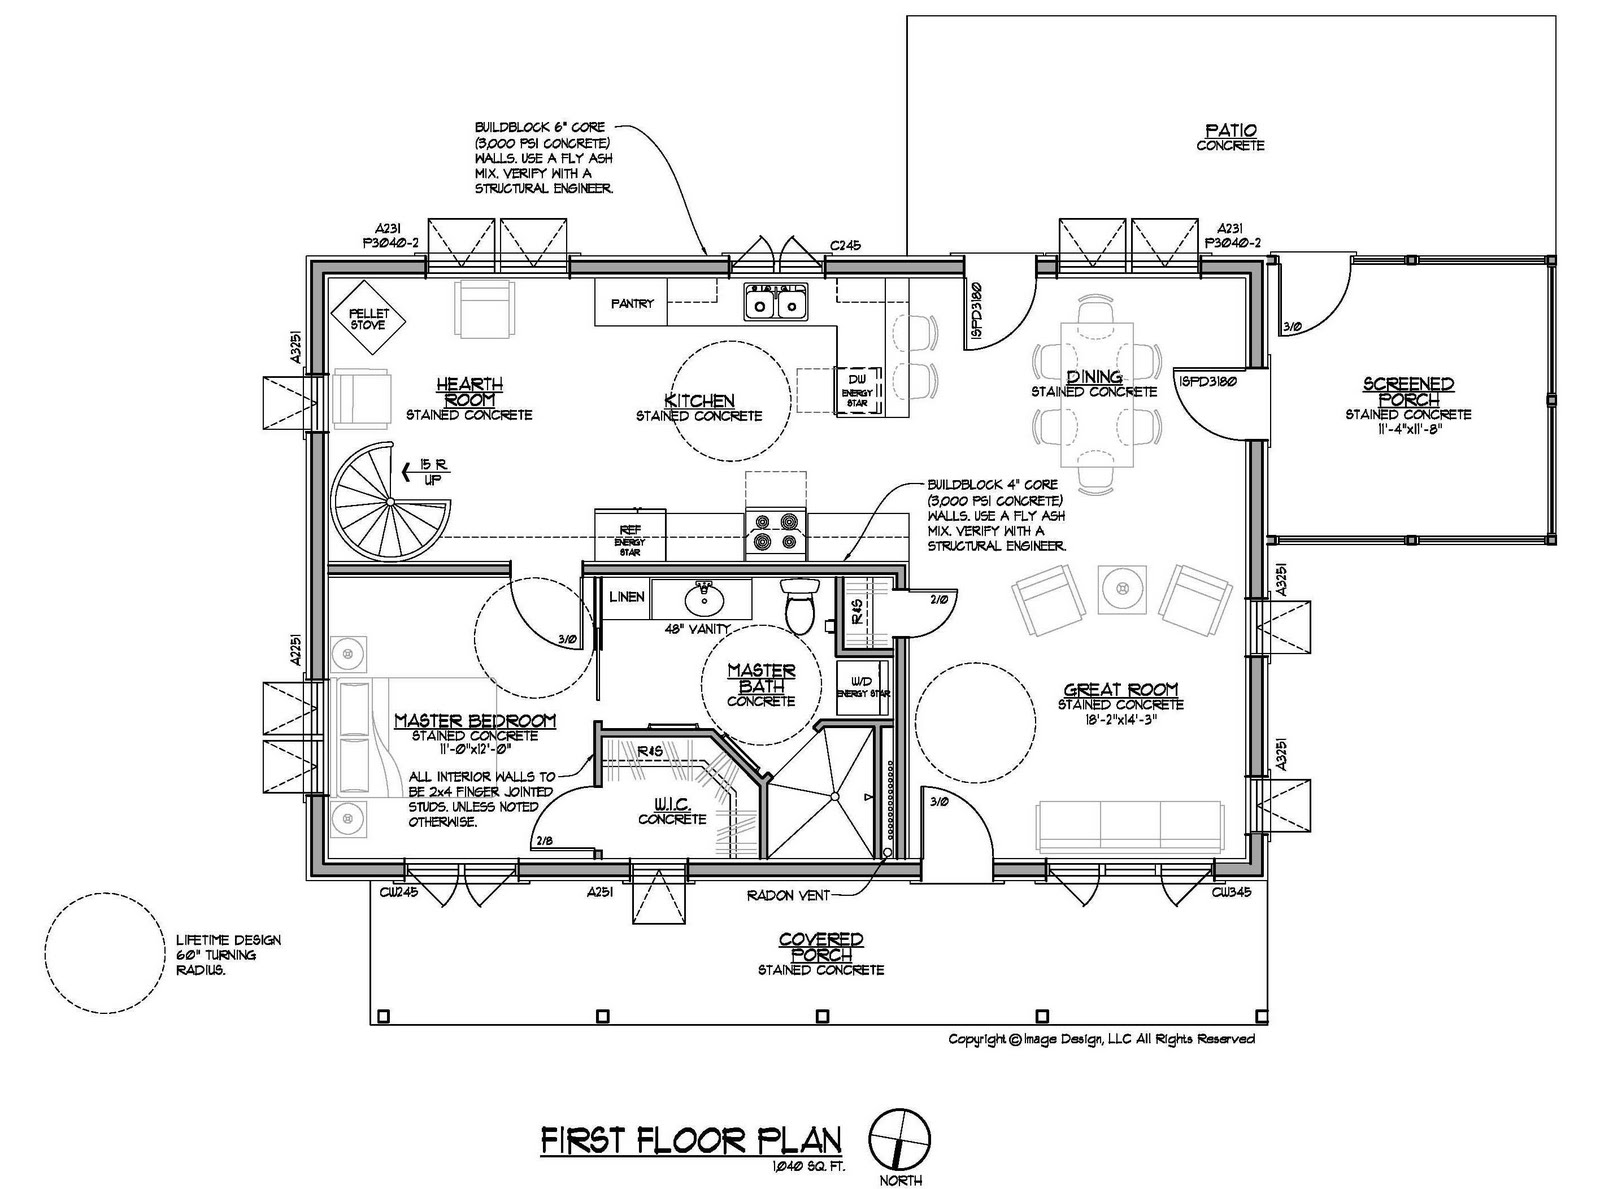 Residential house blueprint symbols for Residential blueprints